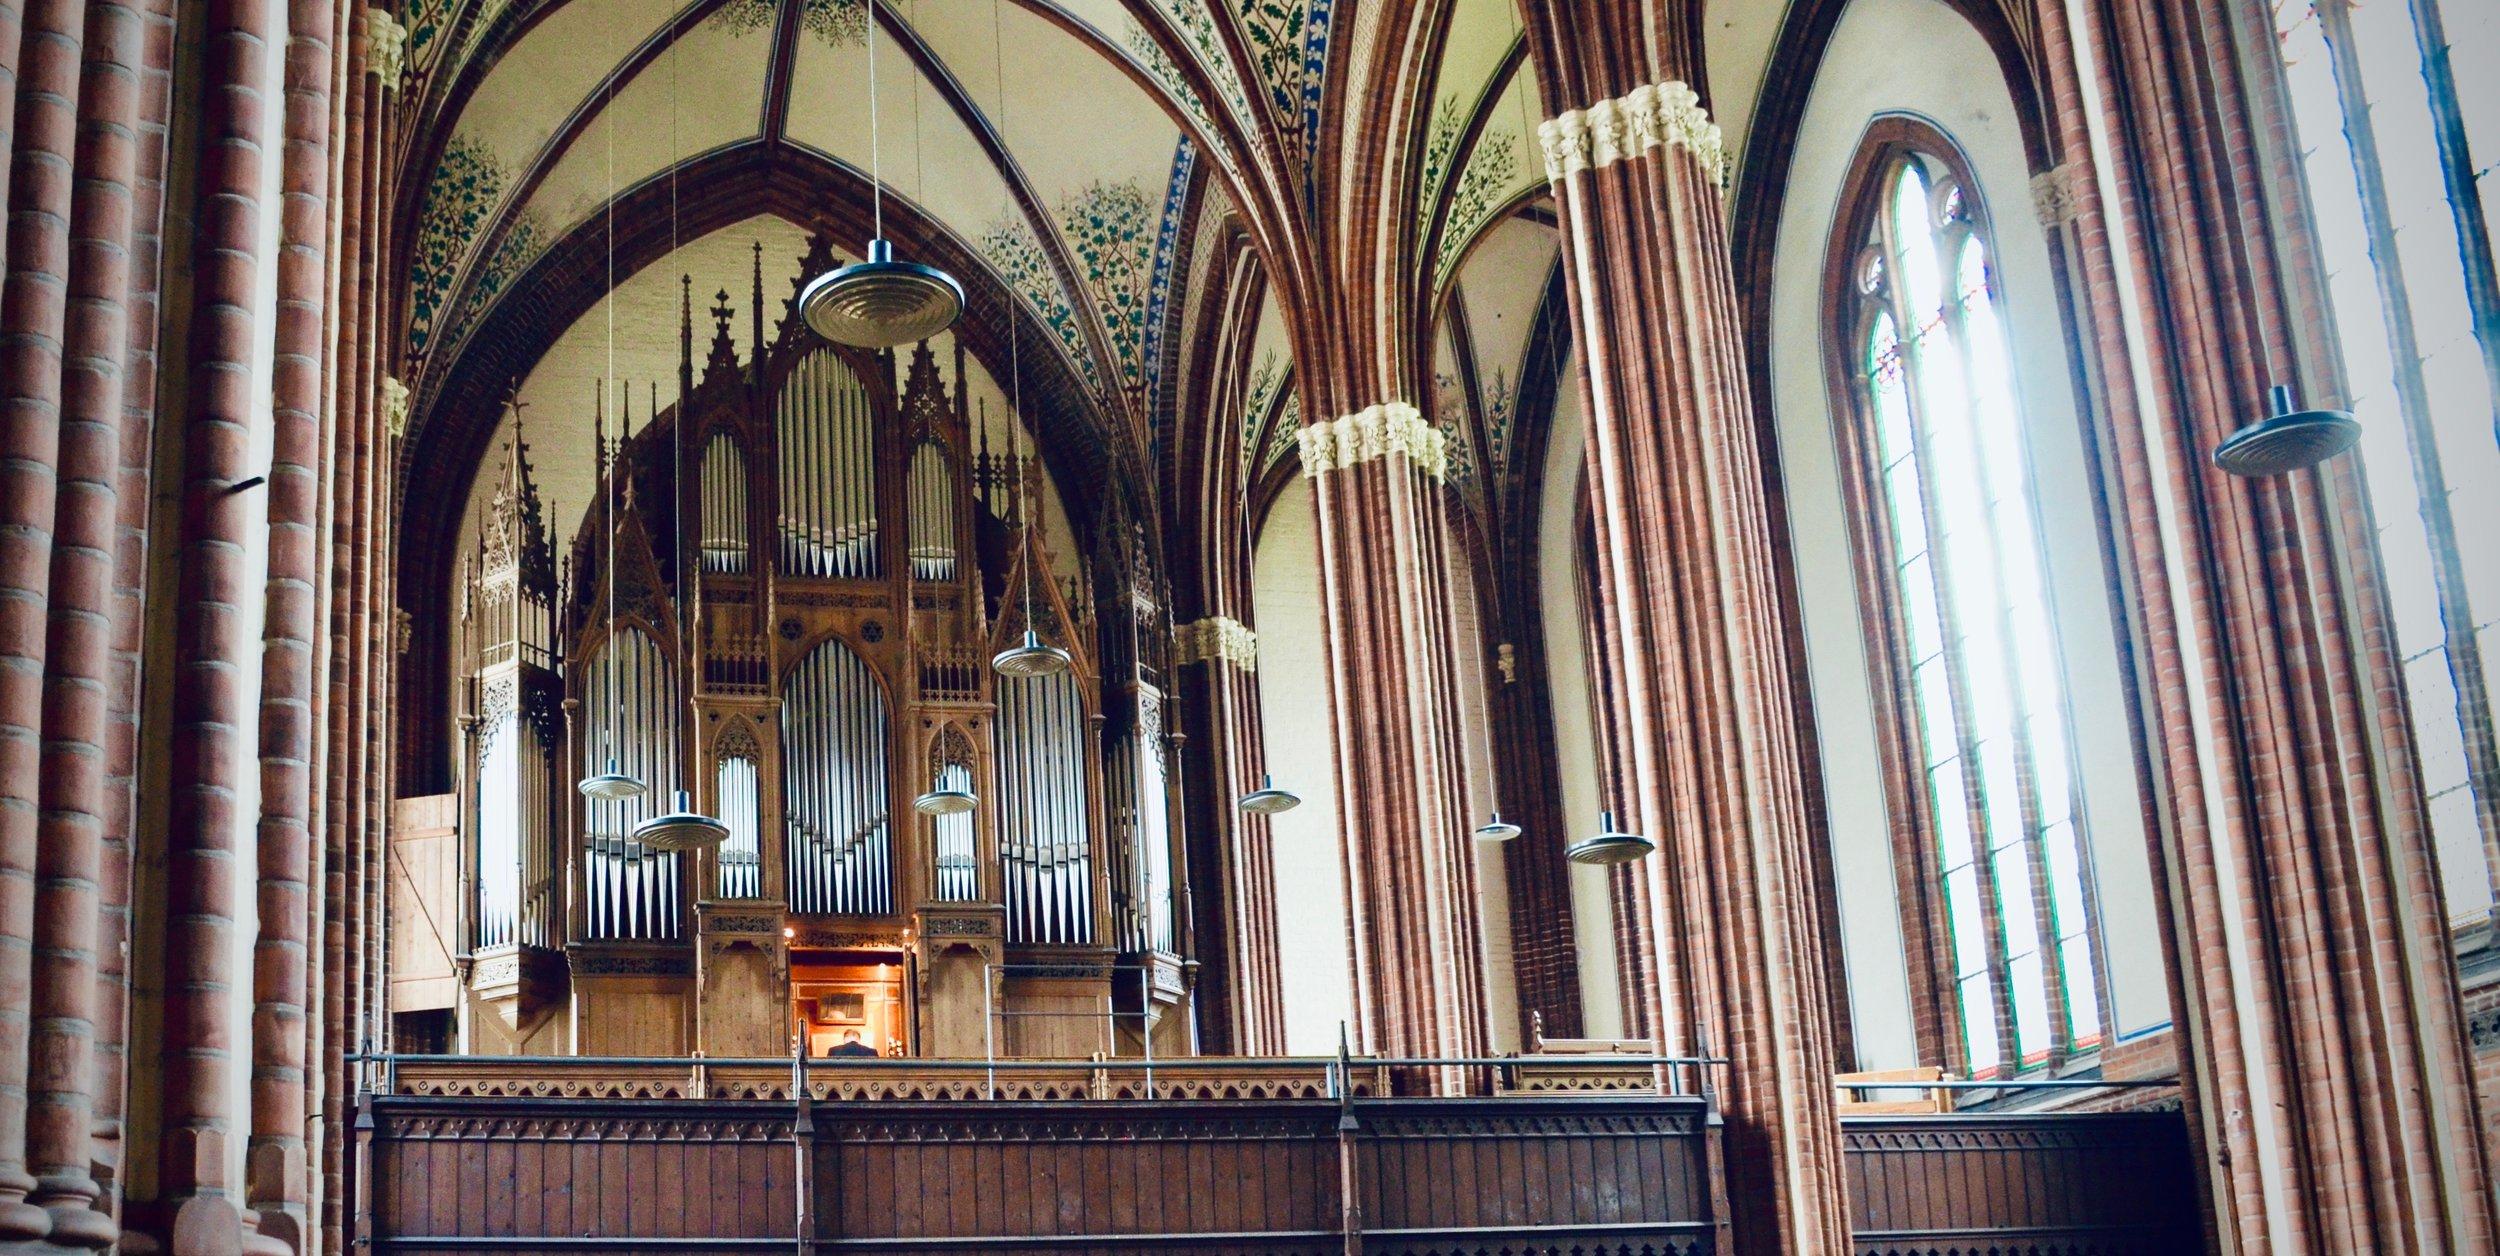 1869 Friese organ, Paulskirche, Schwerin. Boston Organ Studio.